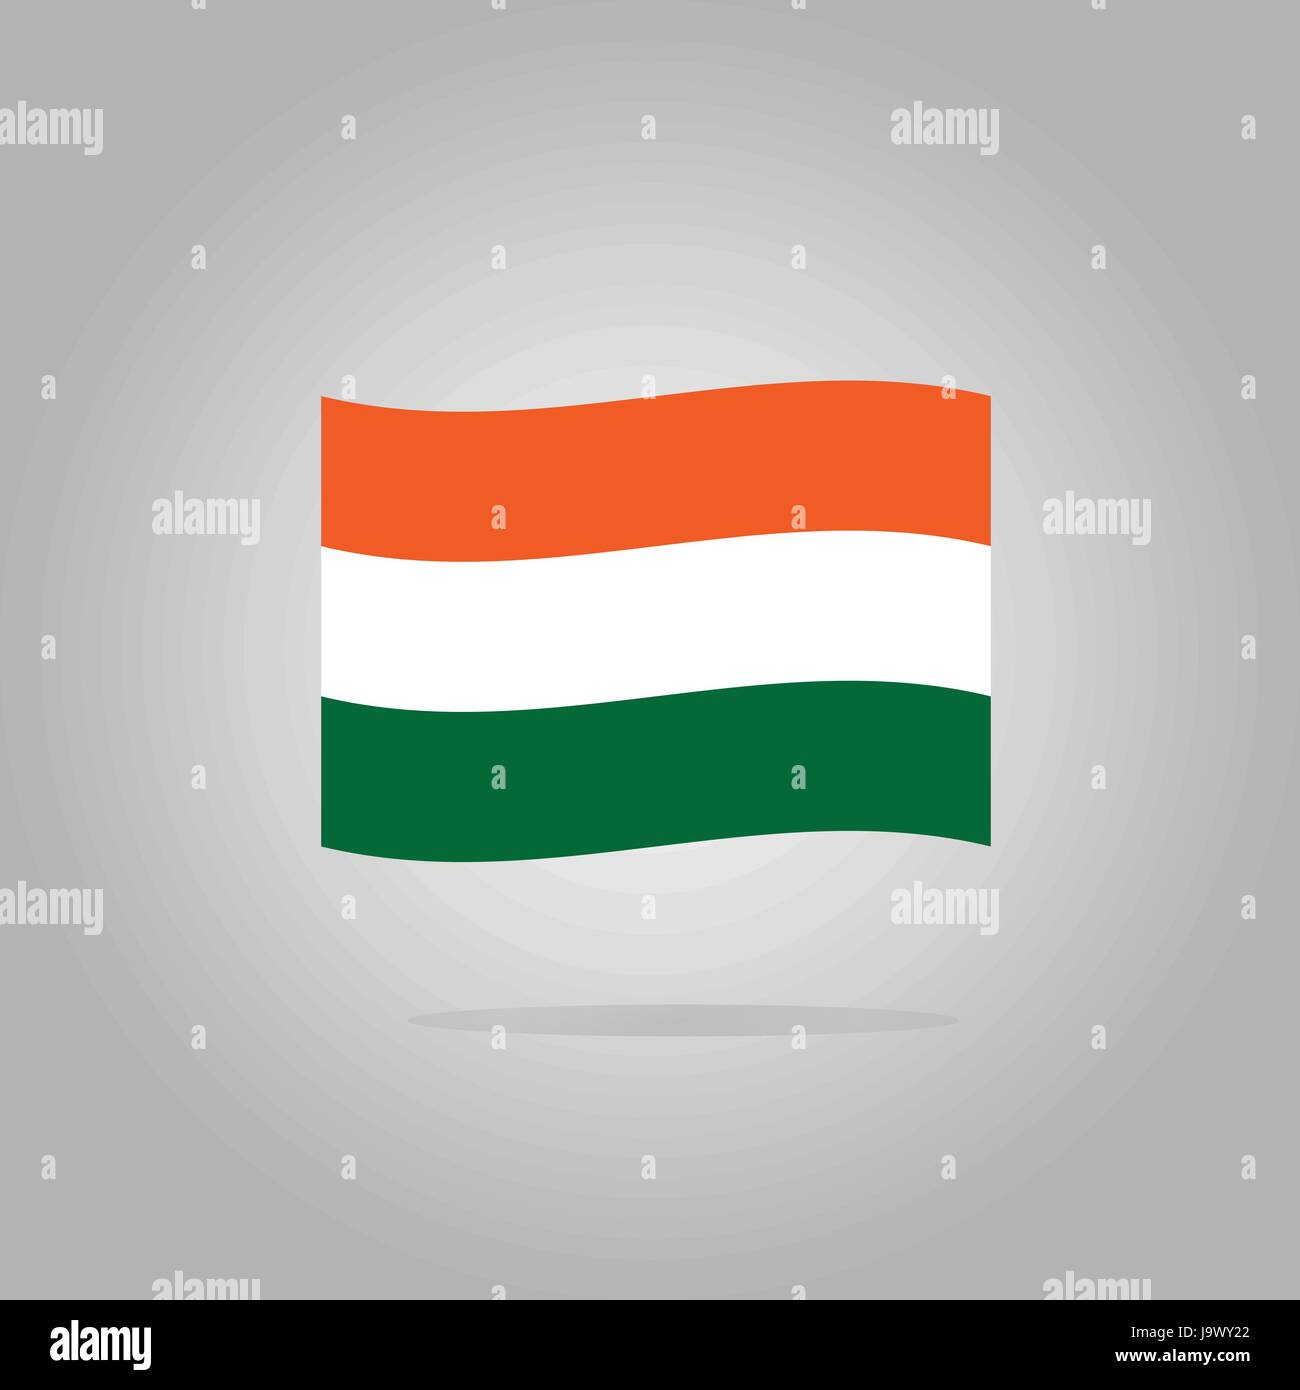 Hungary flag design illustration - Stock Image